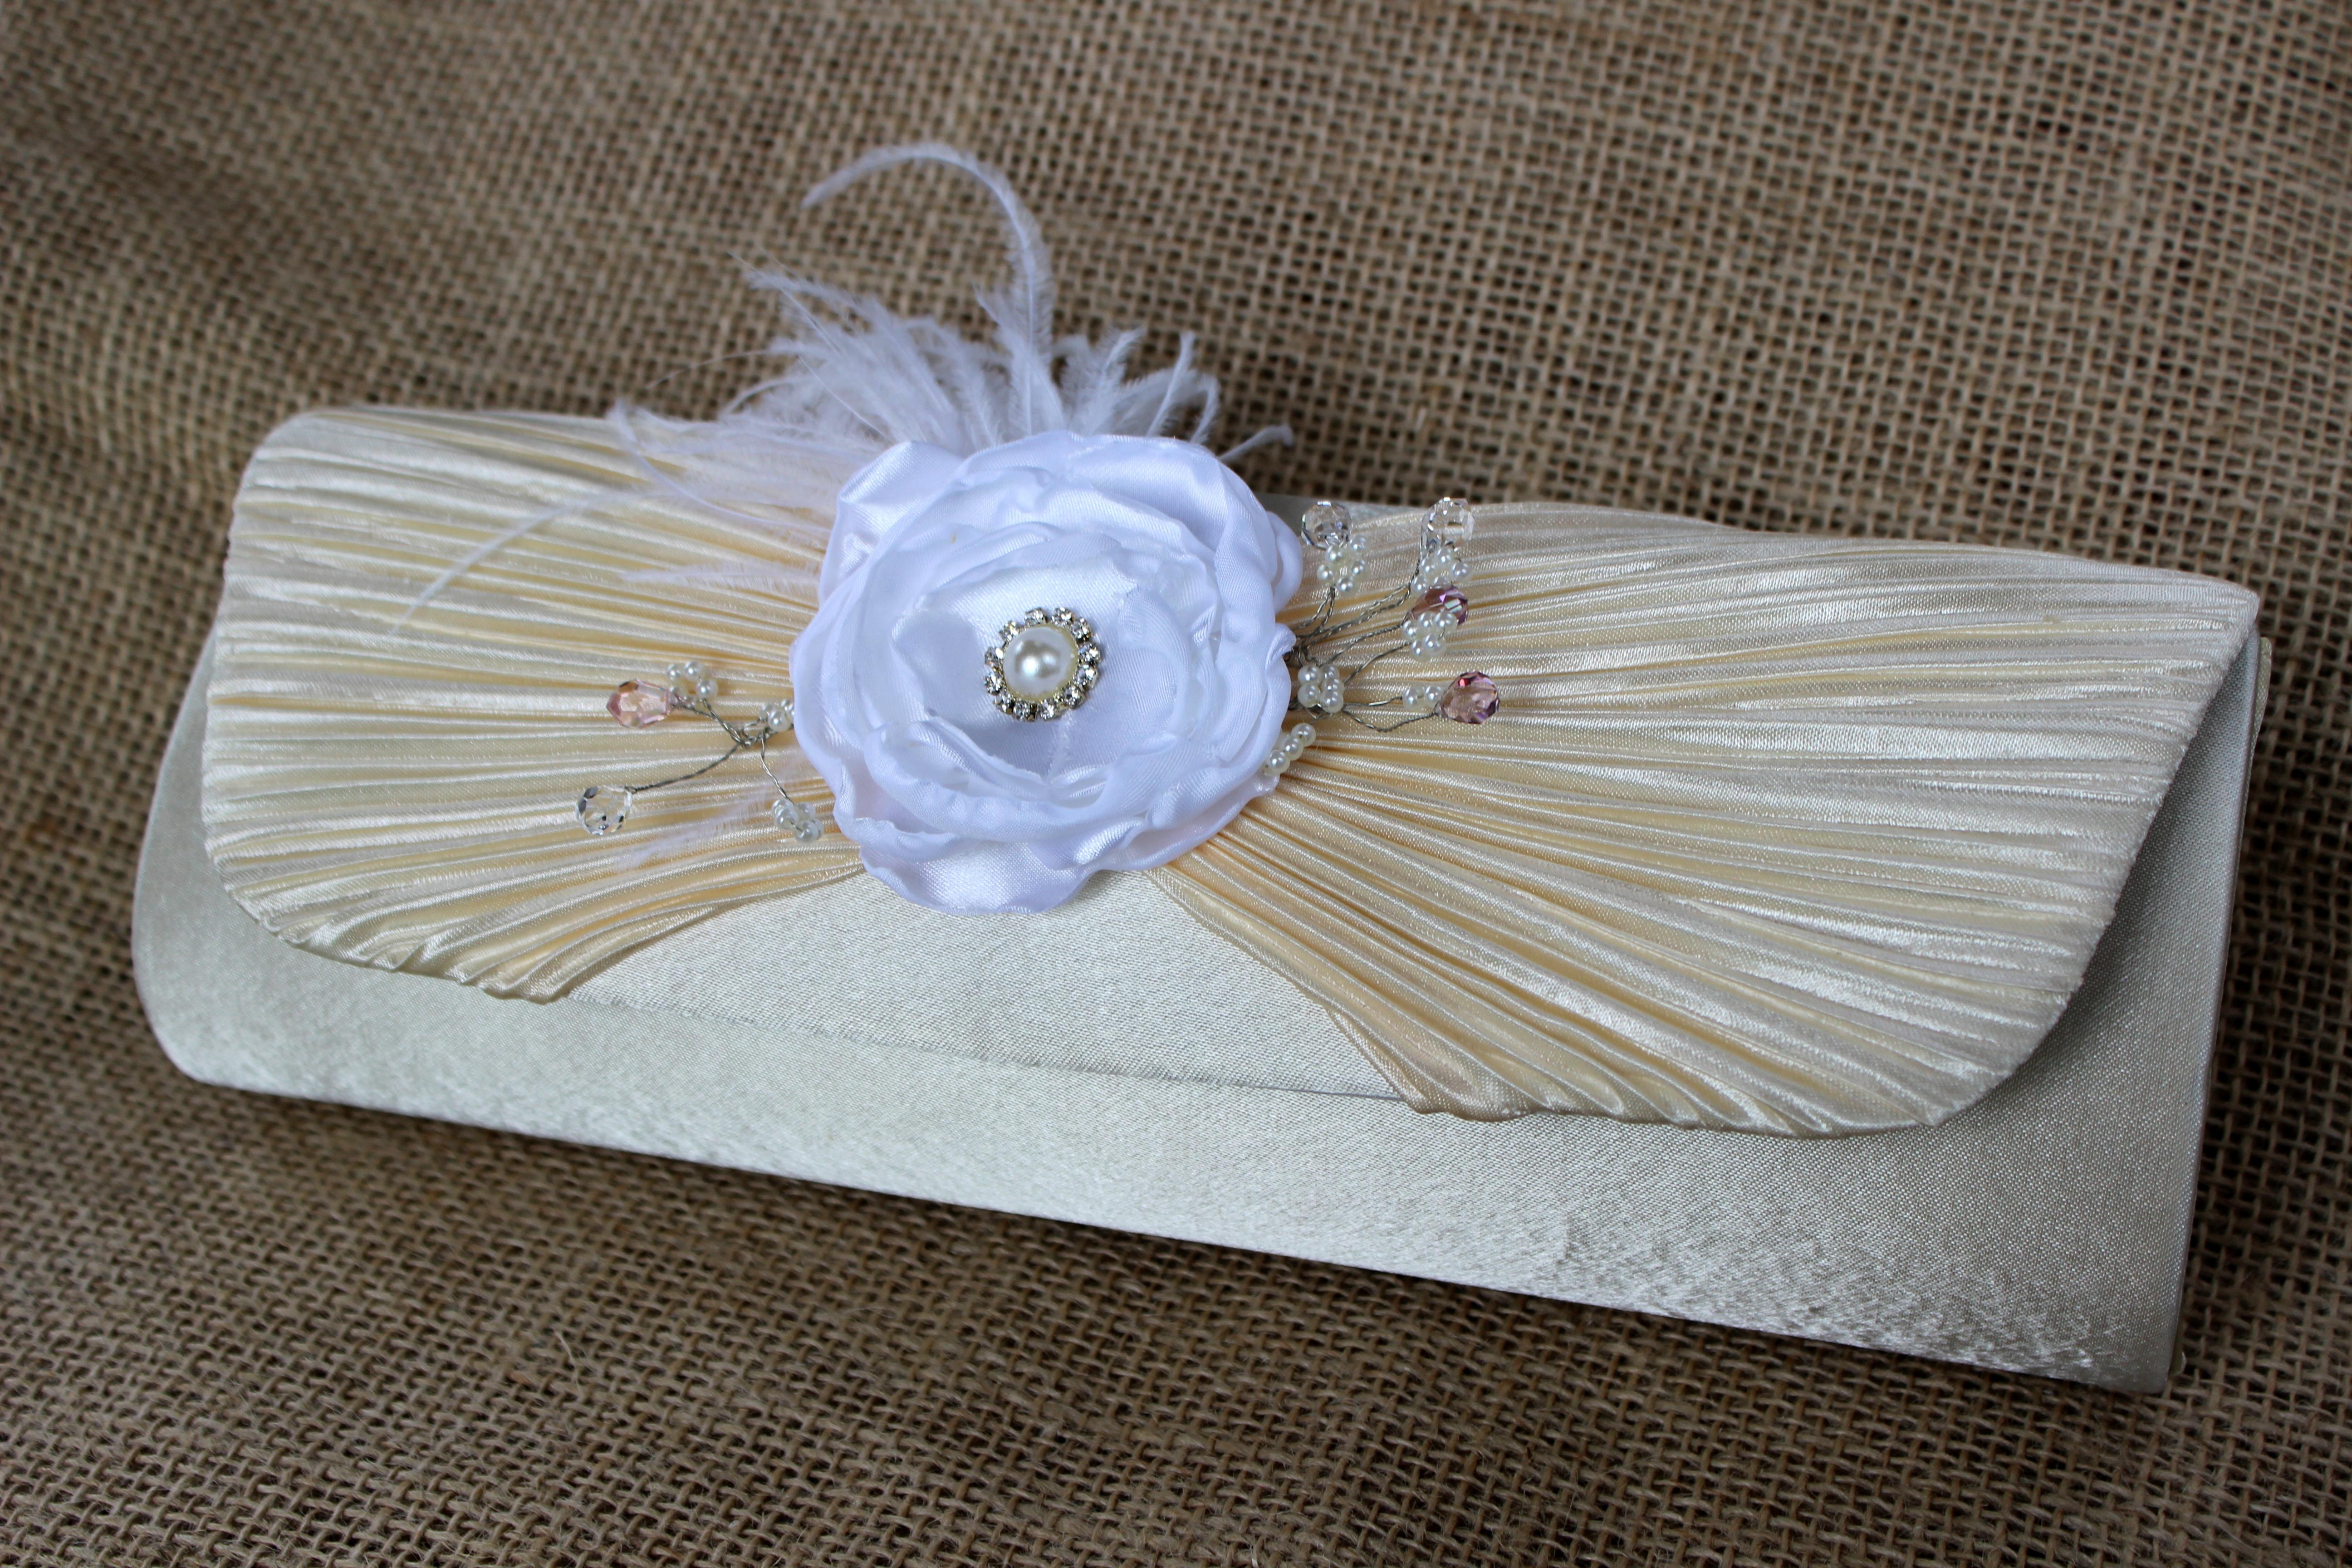 Bolsa De Festa Para Casamento : Bolsa de festa clutch ref bf o santo casamento